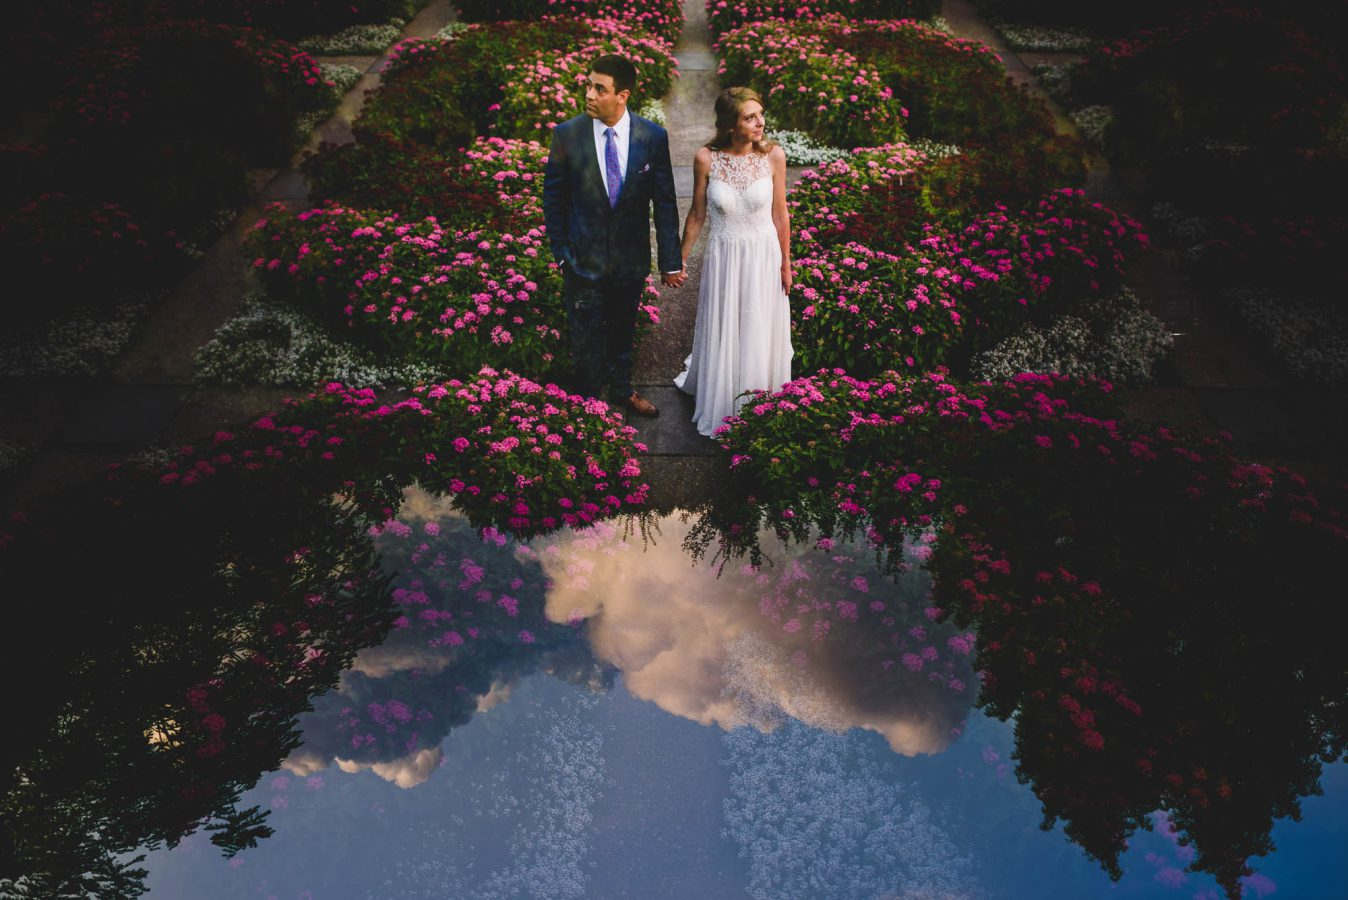 artistic-wedding-photographers-2018-sept-6